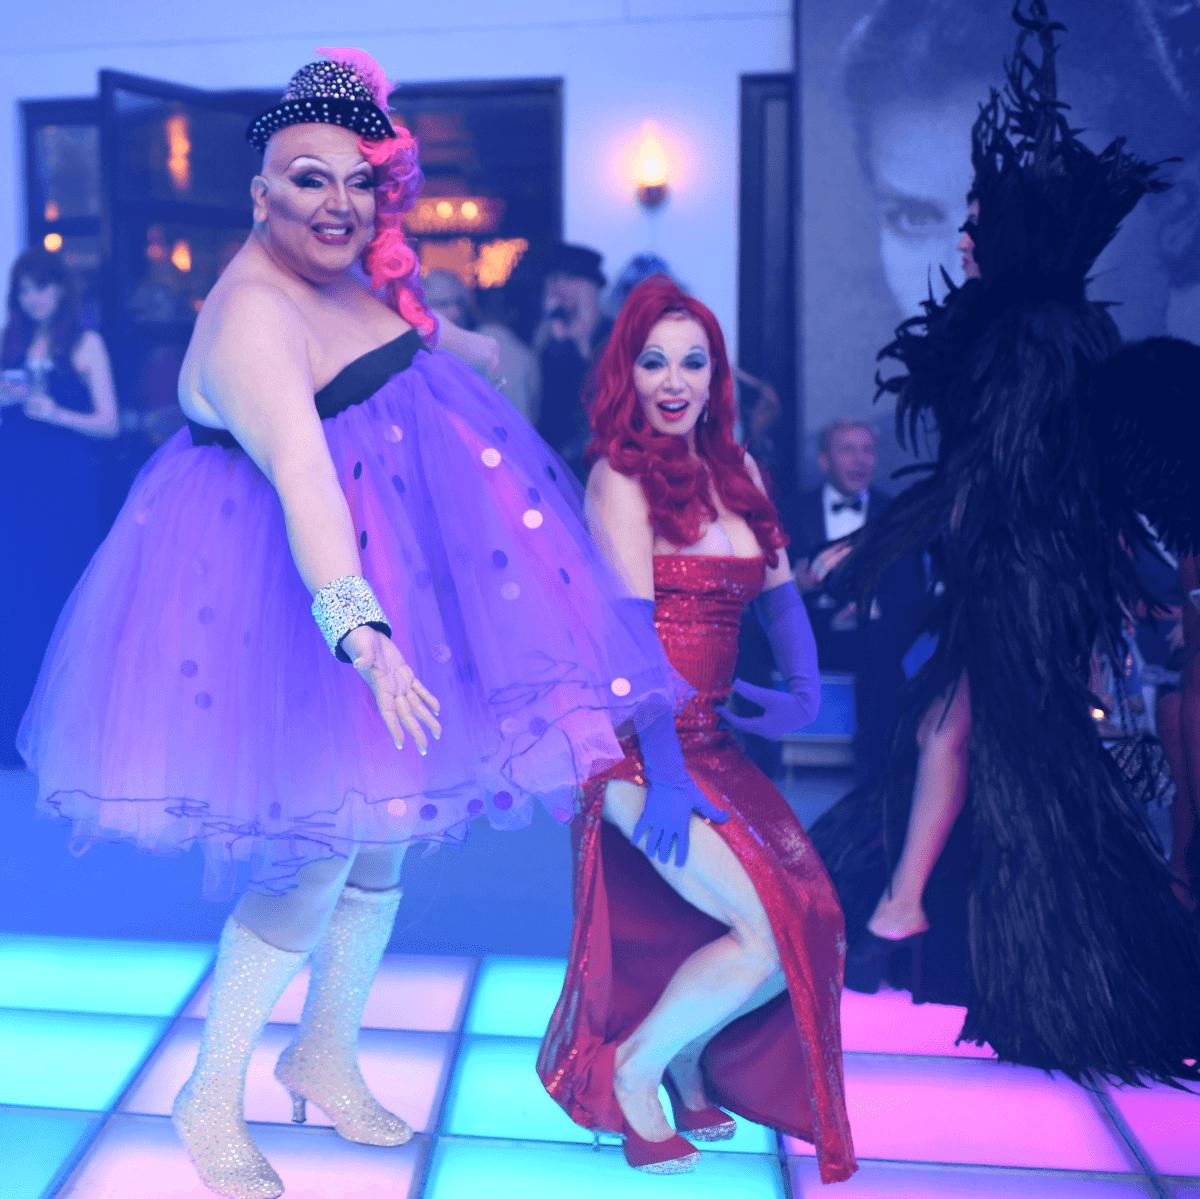 Houston, Hollywood Hollyween Party, Oct. 2016, Rosemarie Johnson, Cindi Rose